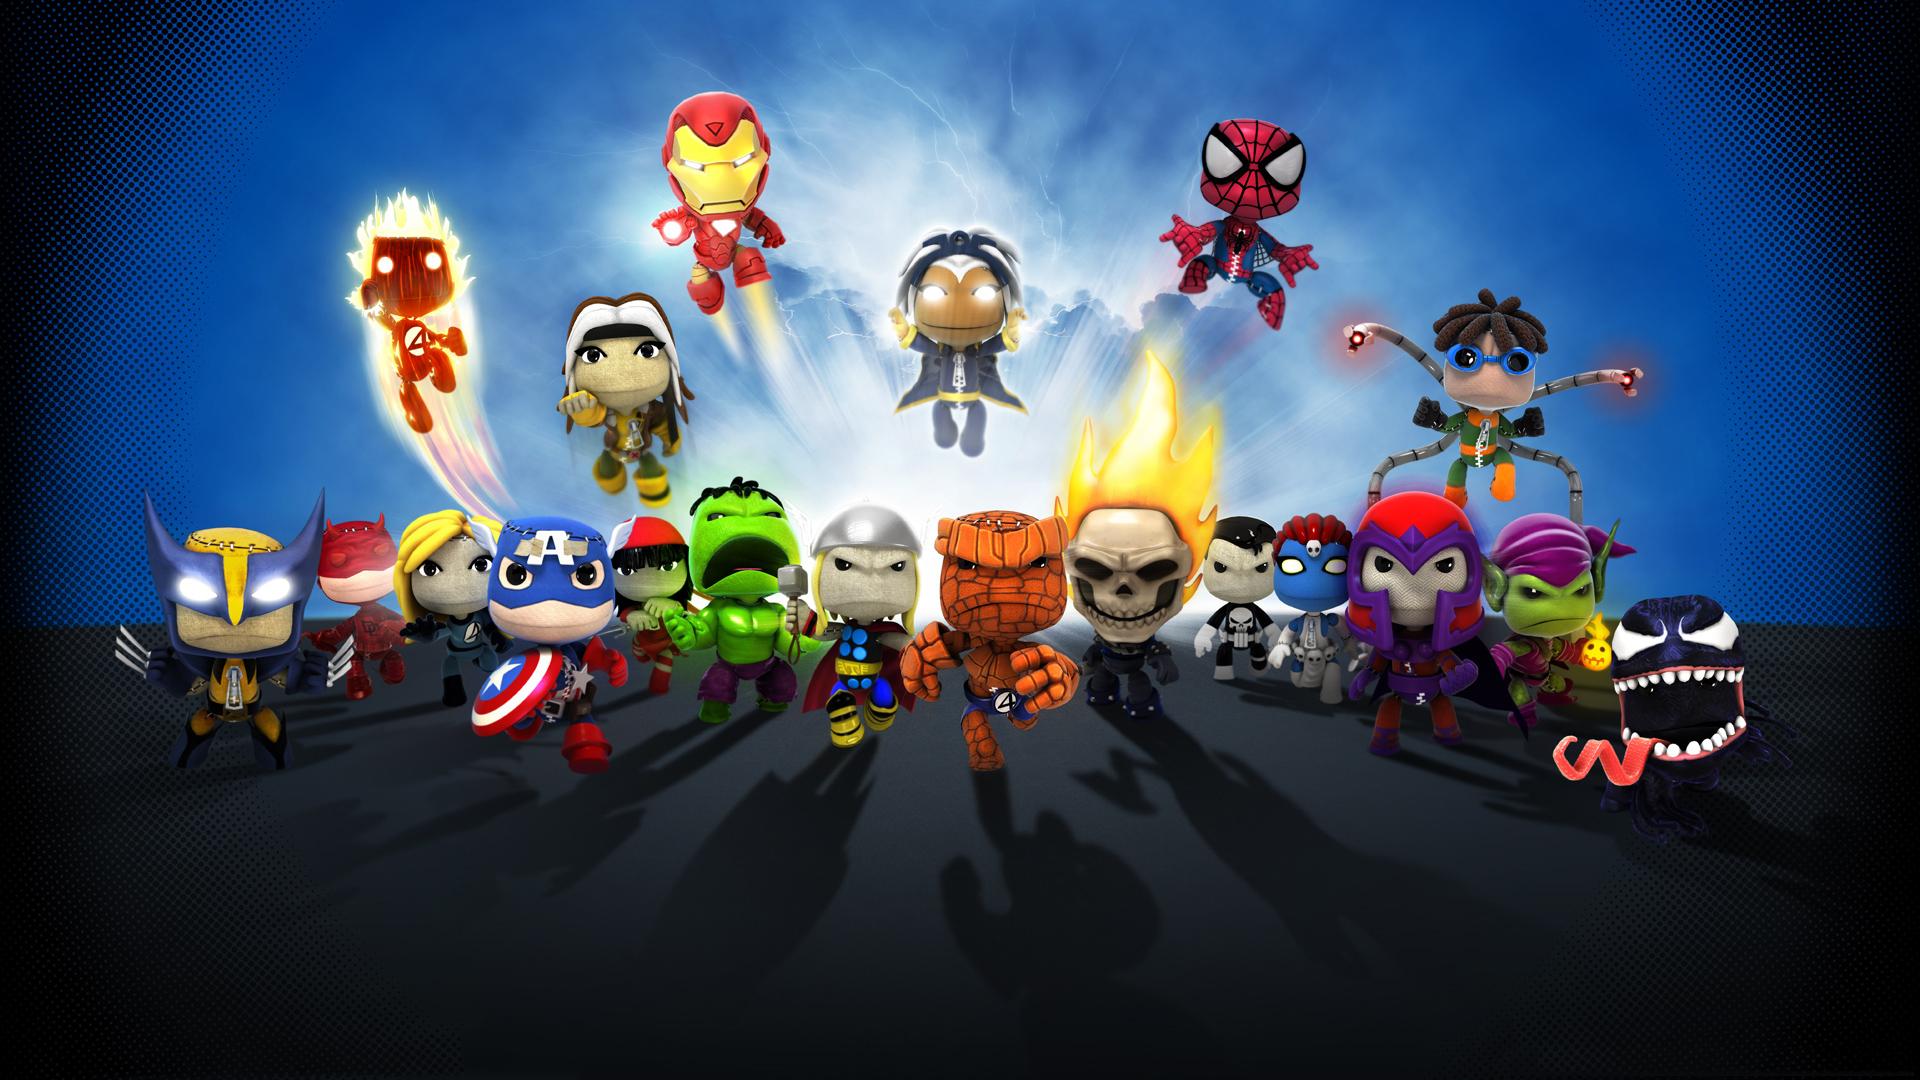 Superhero Wallpaper HD 1920x1080